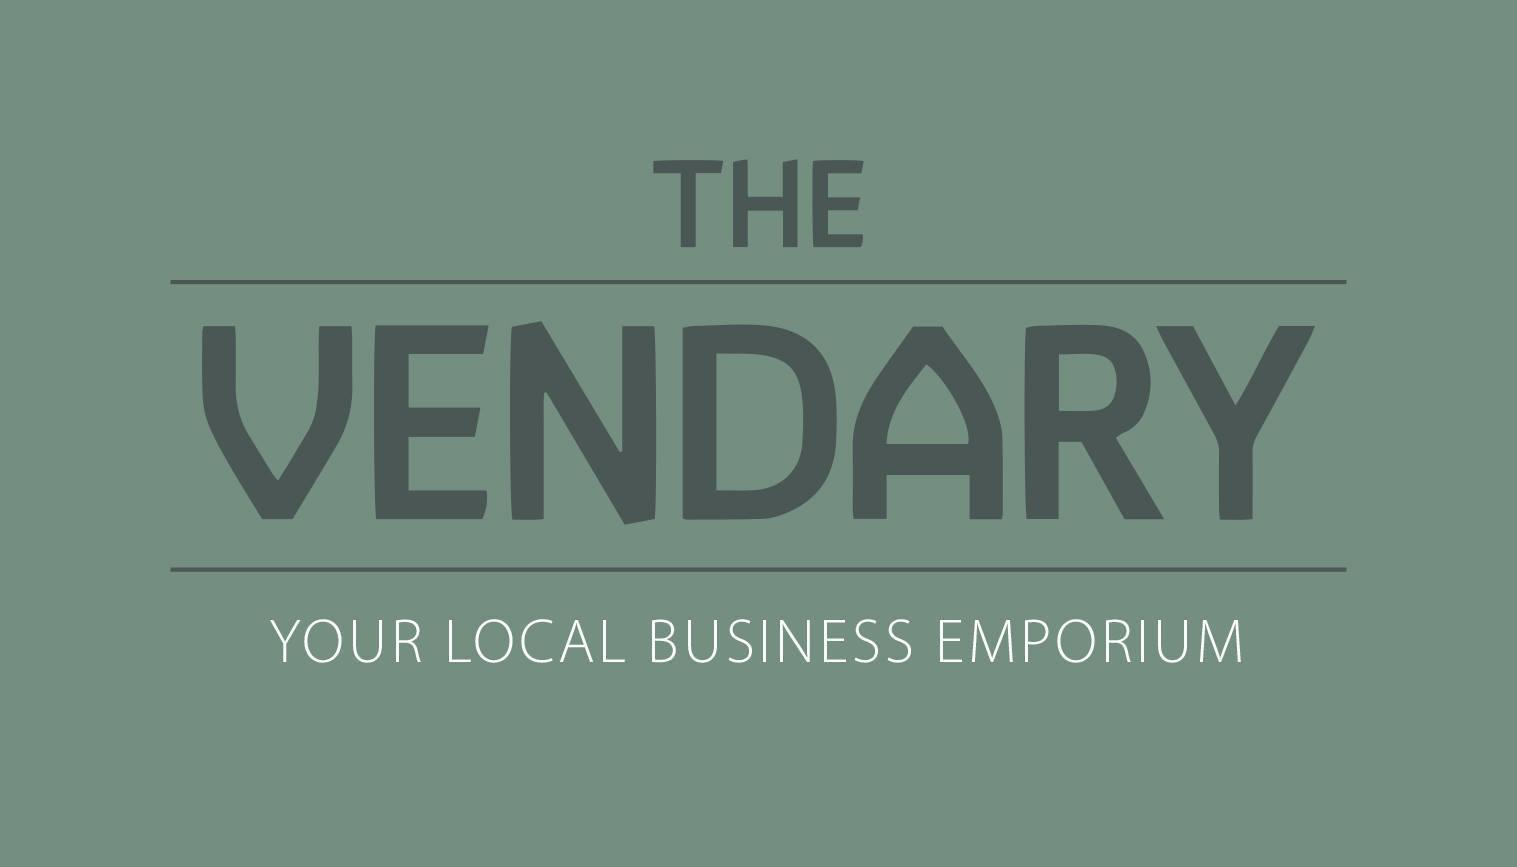 The Vendary